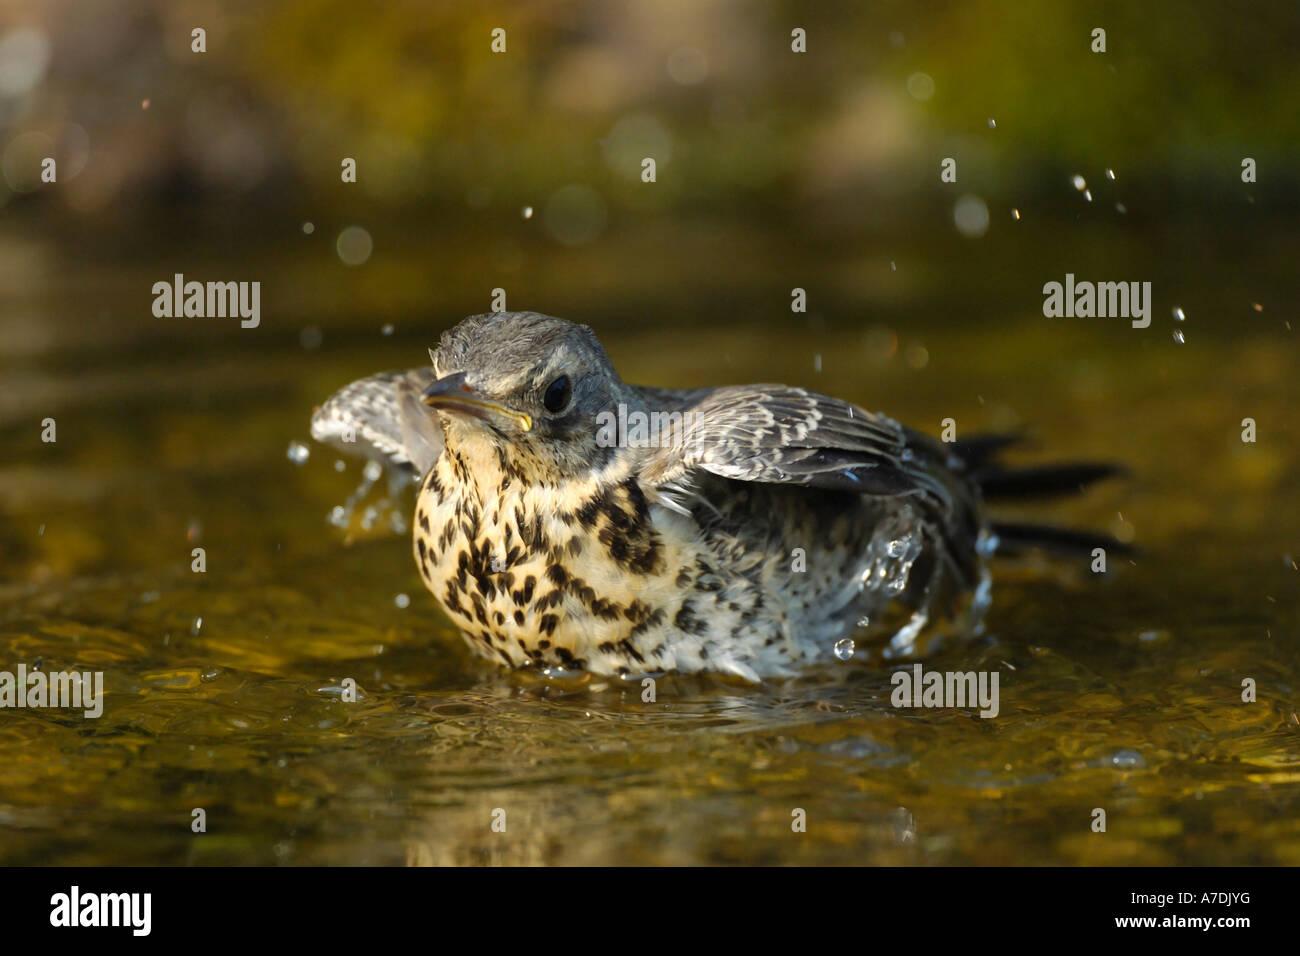 Wacholderdrossel Turdus pilaris Fieldfare Krummetvogel Stock Photo